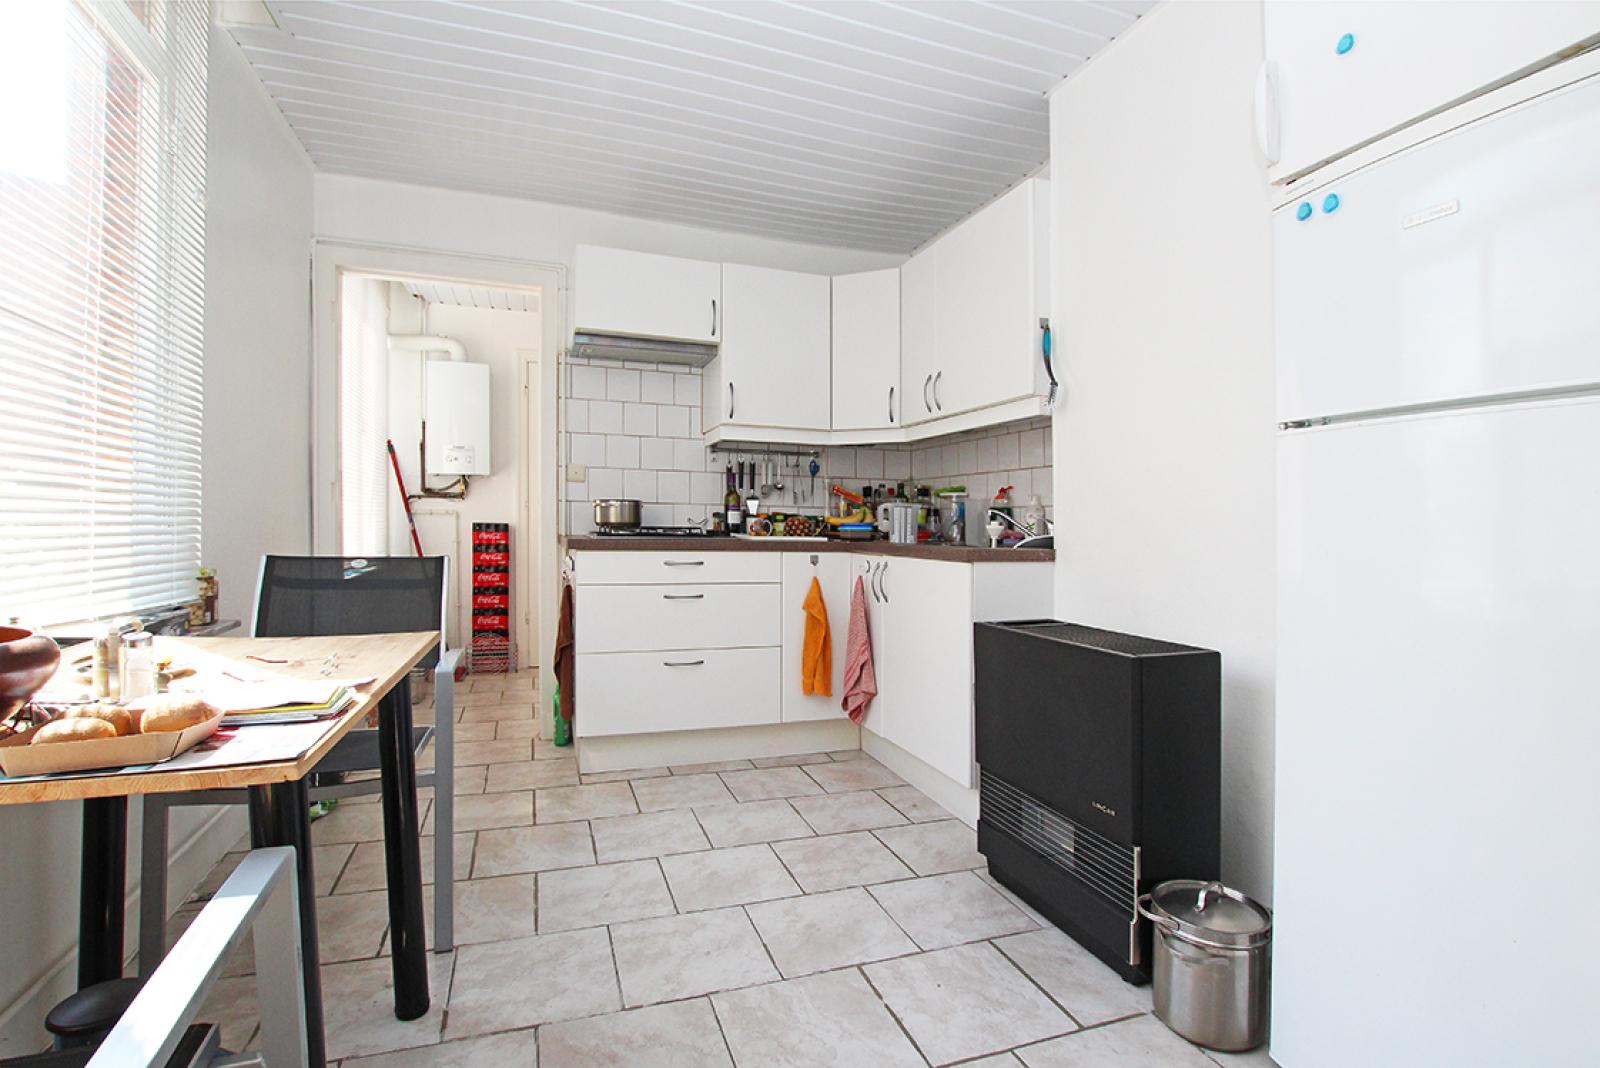 Charmant 2-slpk appartement op leuke locatie te Berchem! afbeelding 7